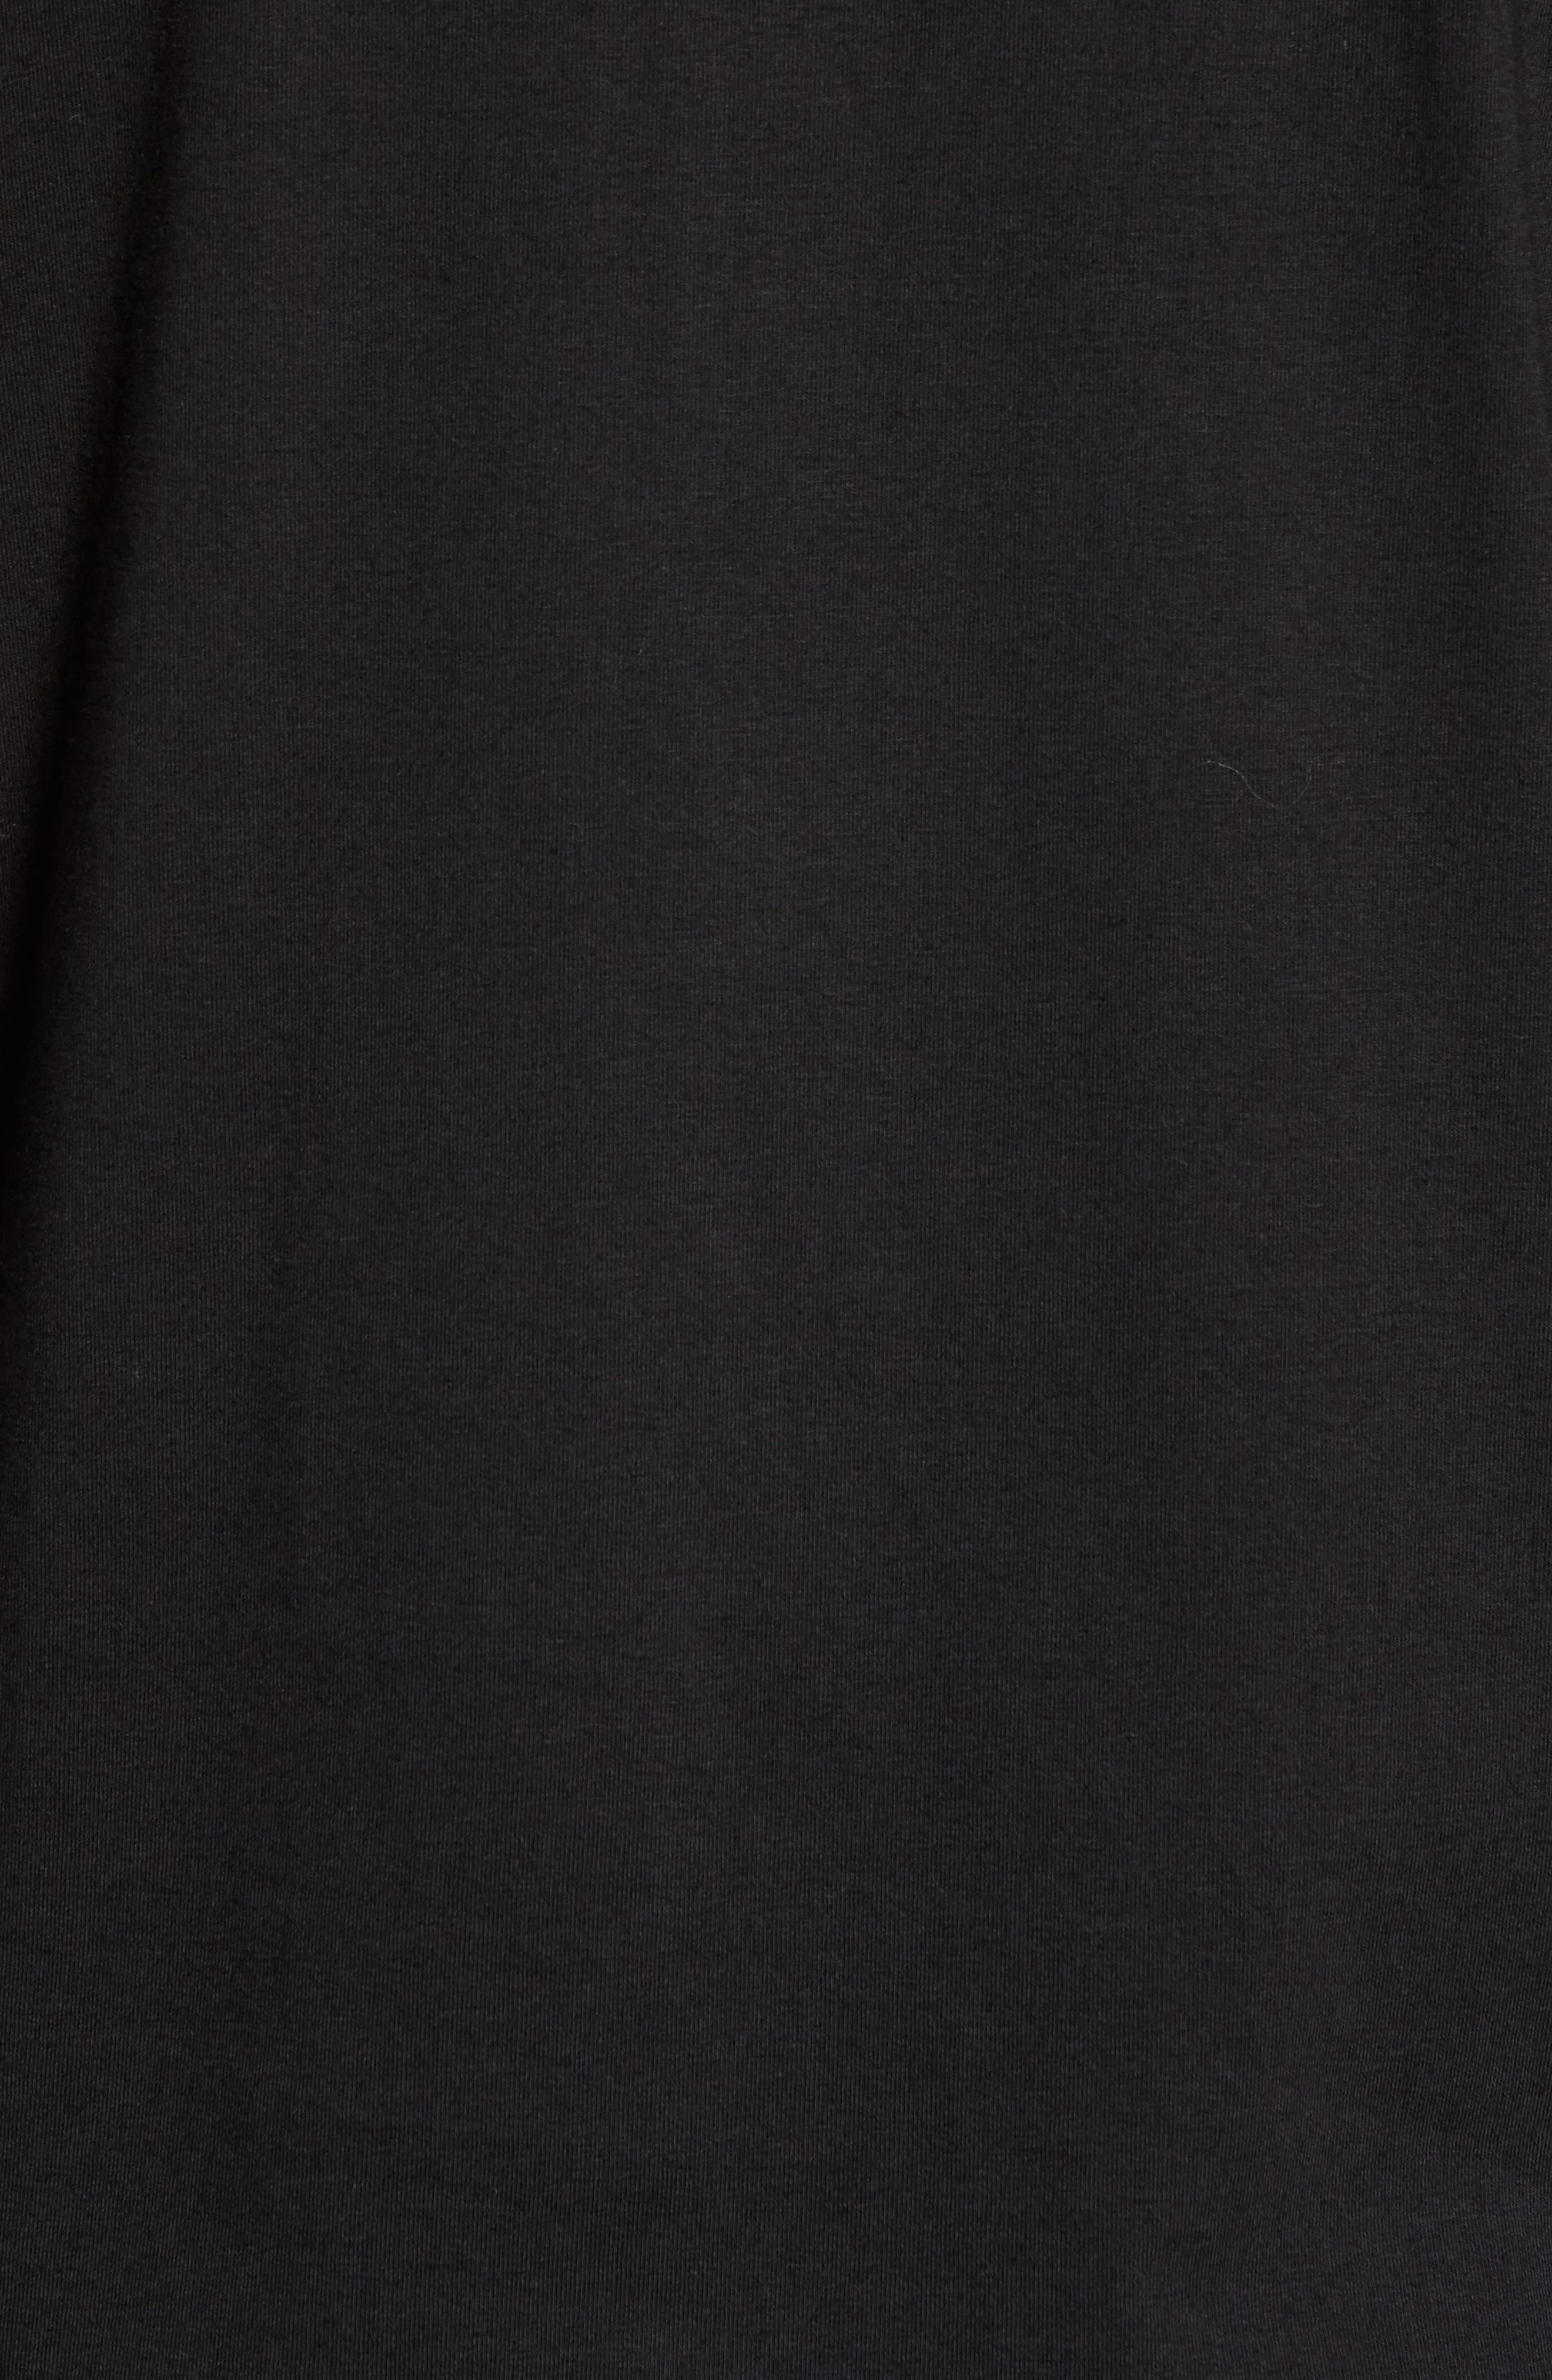 Charge Quarter-Zip Pullover,                             Alternate thumbnail 5, color,                             Black/ Gunmetal